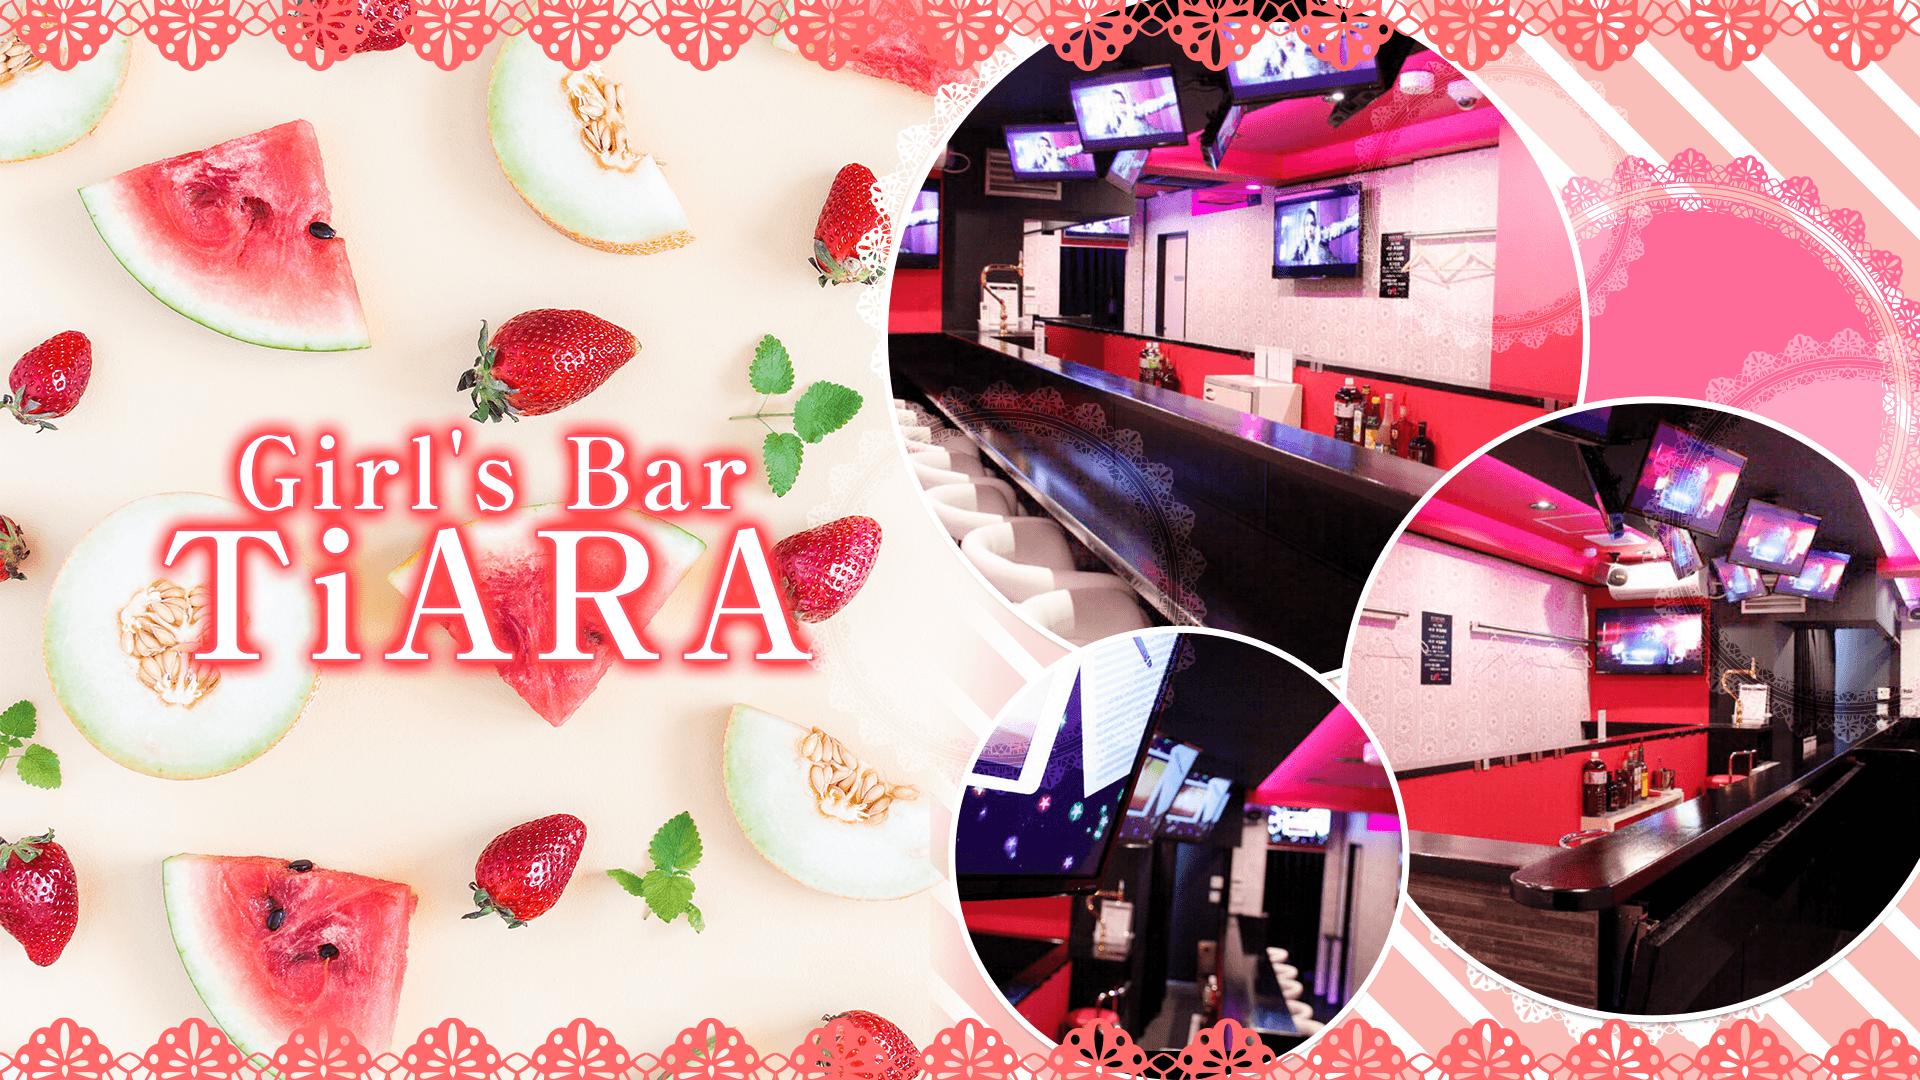 Girl's Bar TiARA(ティアラ) 大宮ガールズバー TOP画像